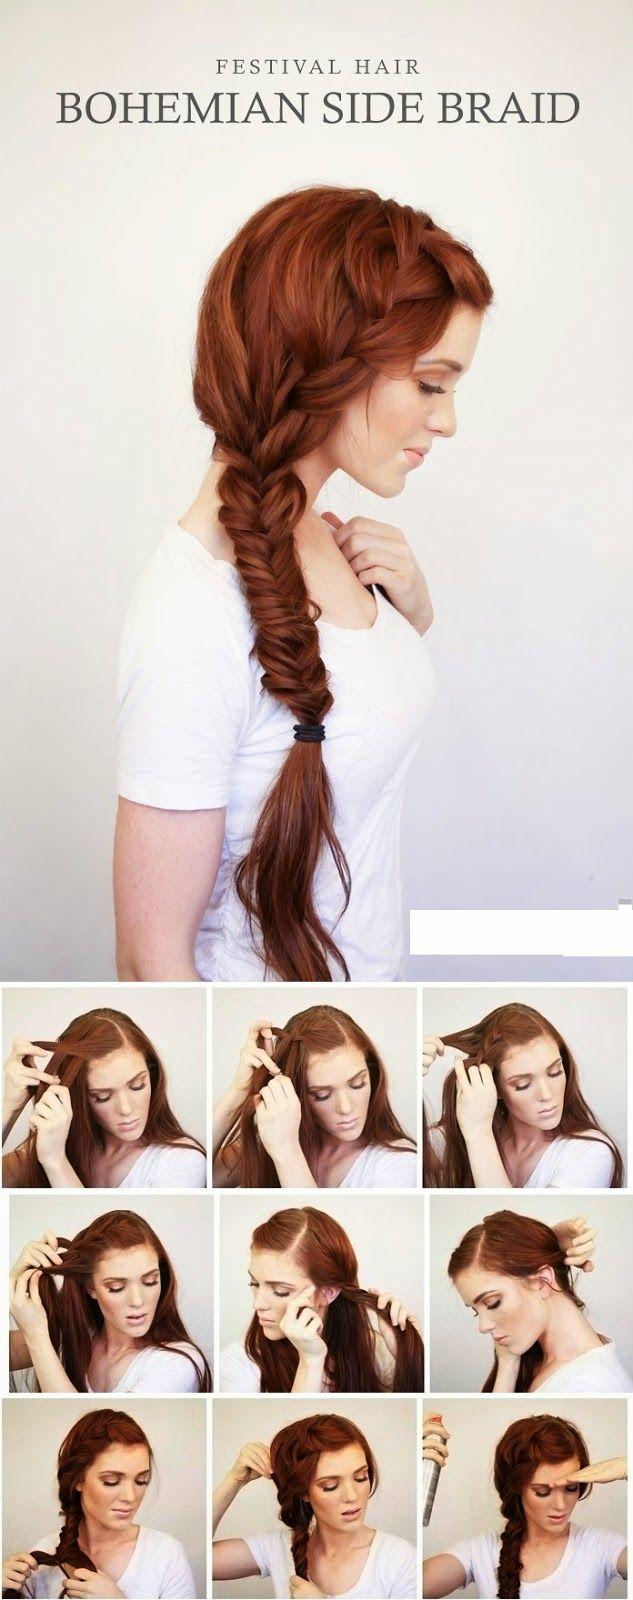 Fine Teenage Fashion Blog Bohemian Side Braid Festival Hair Tutorial Hairstyles For Men Maxibearus